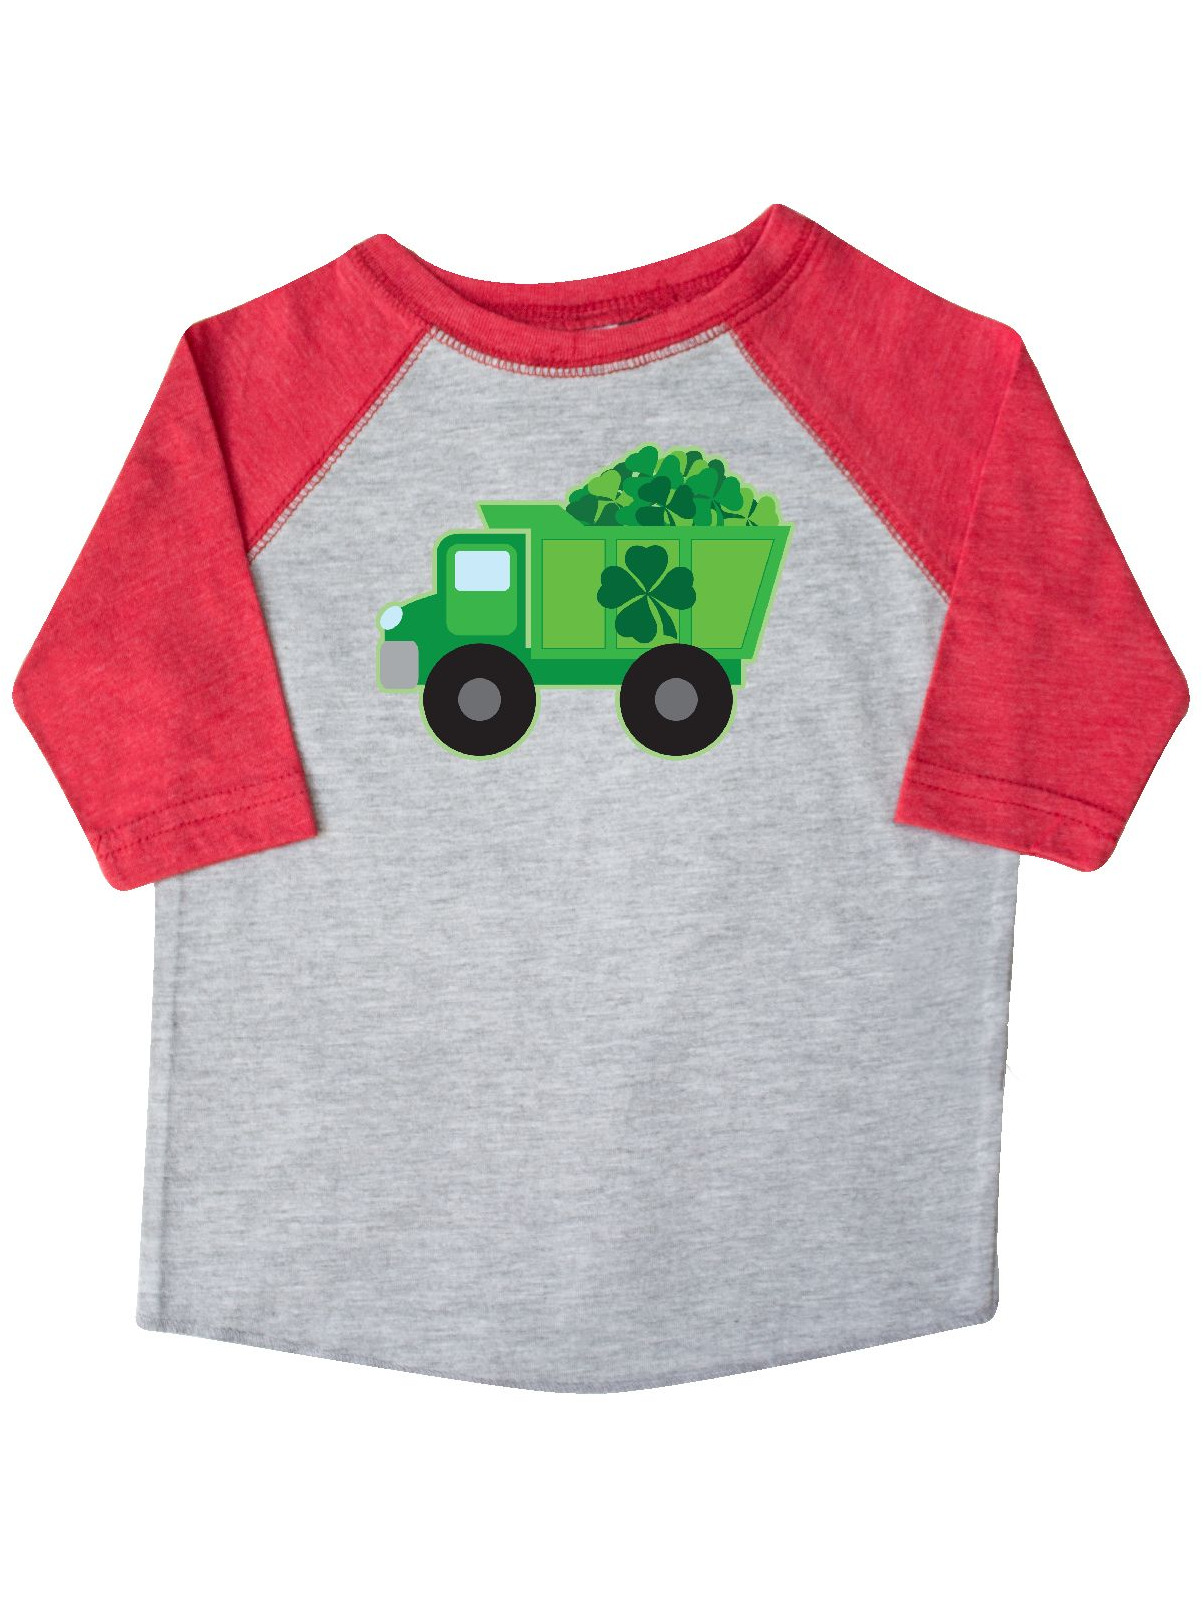 St Patricks Day Irish Clover Dump Truck Childs Toddler T-Shirt